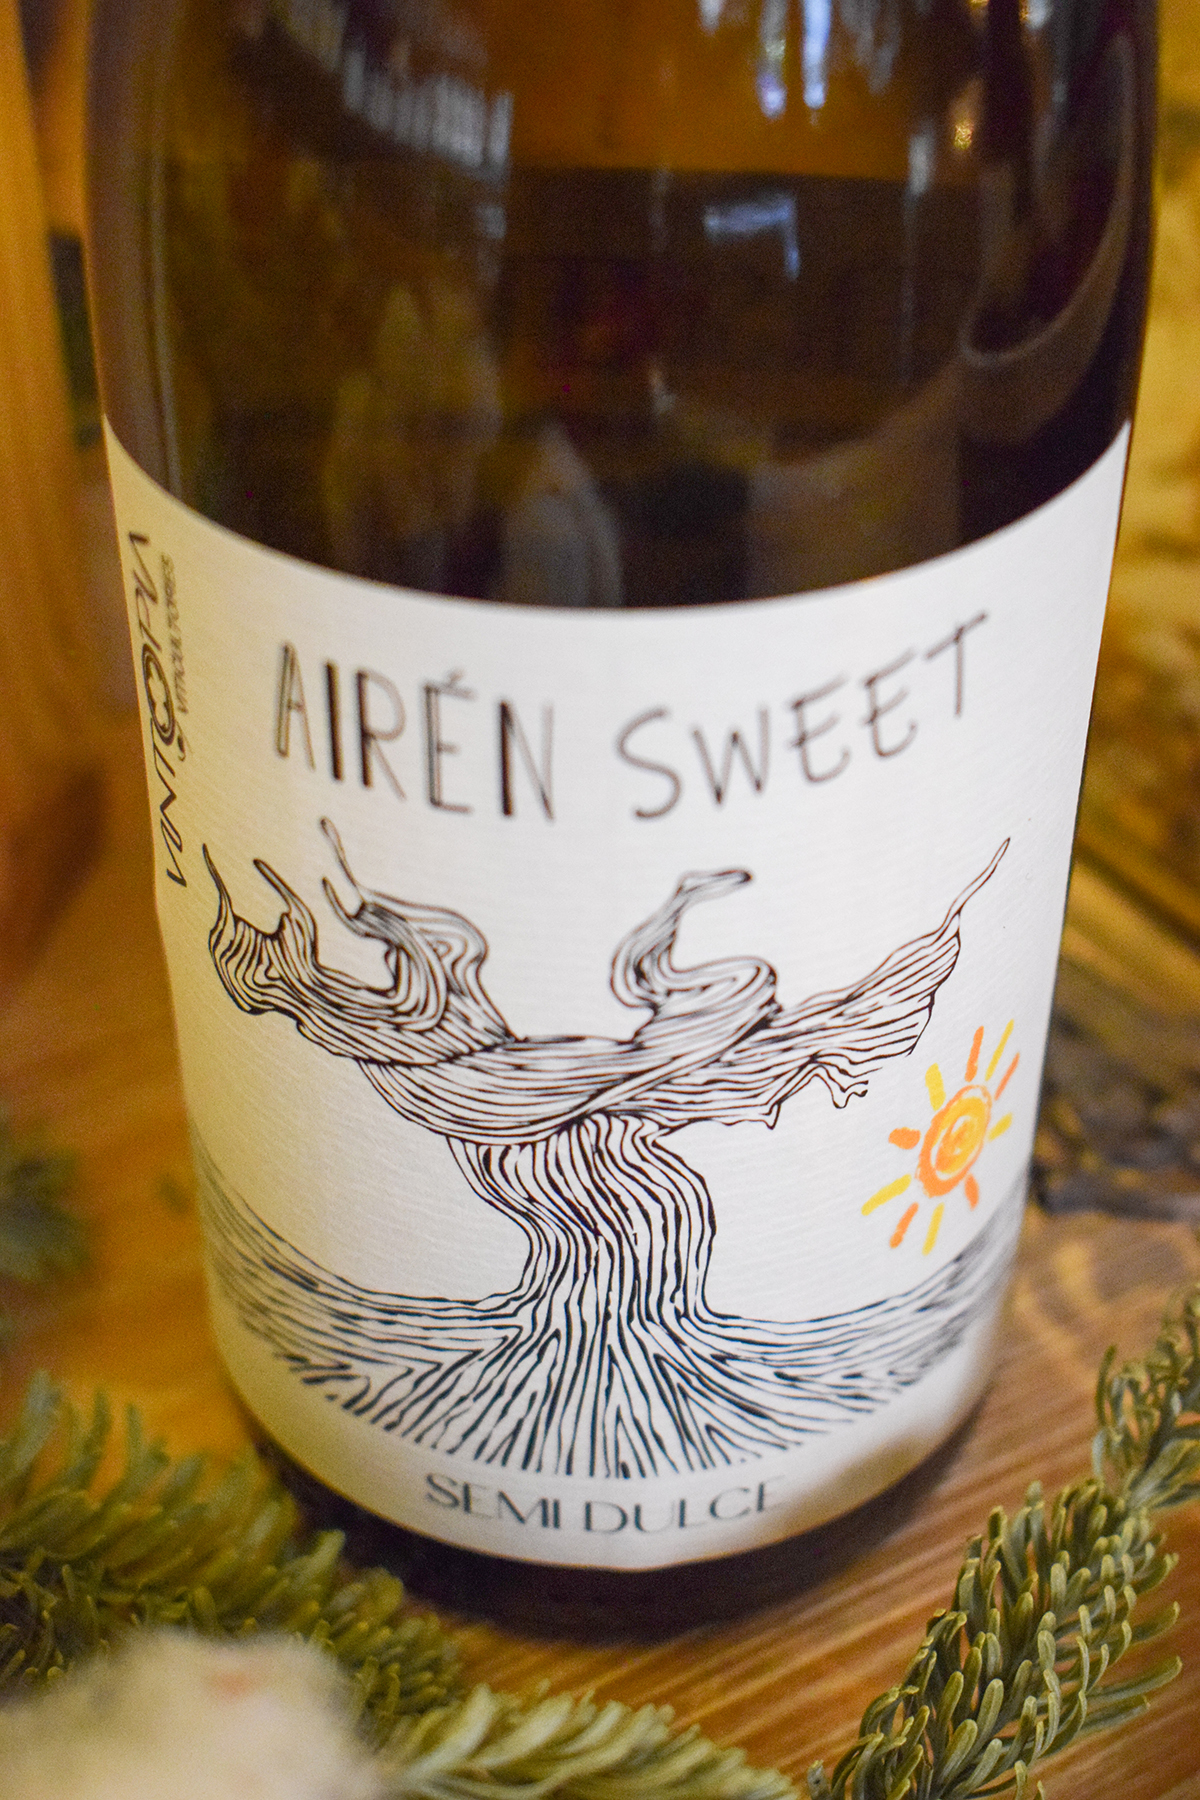 Vintopia Airén Sweet 2019